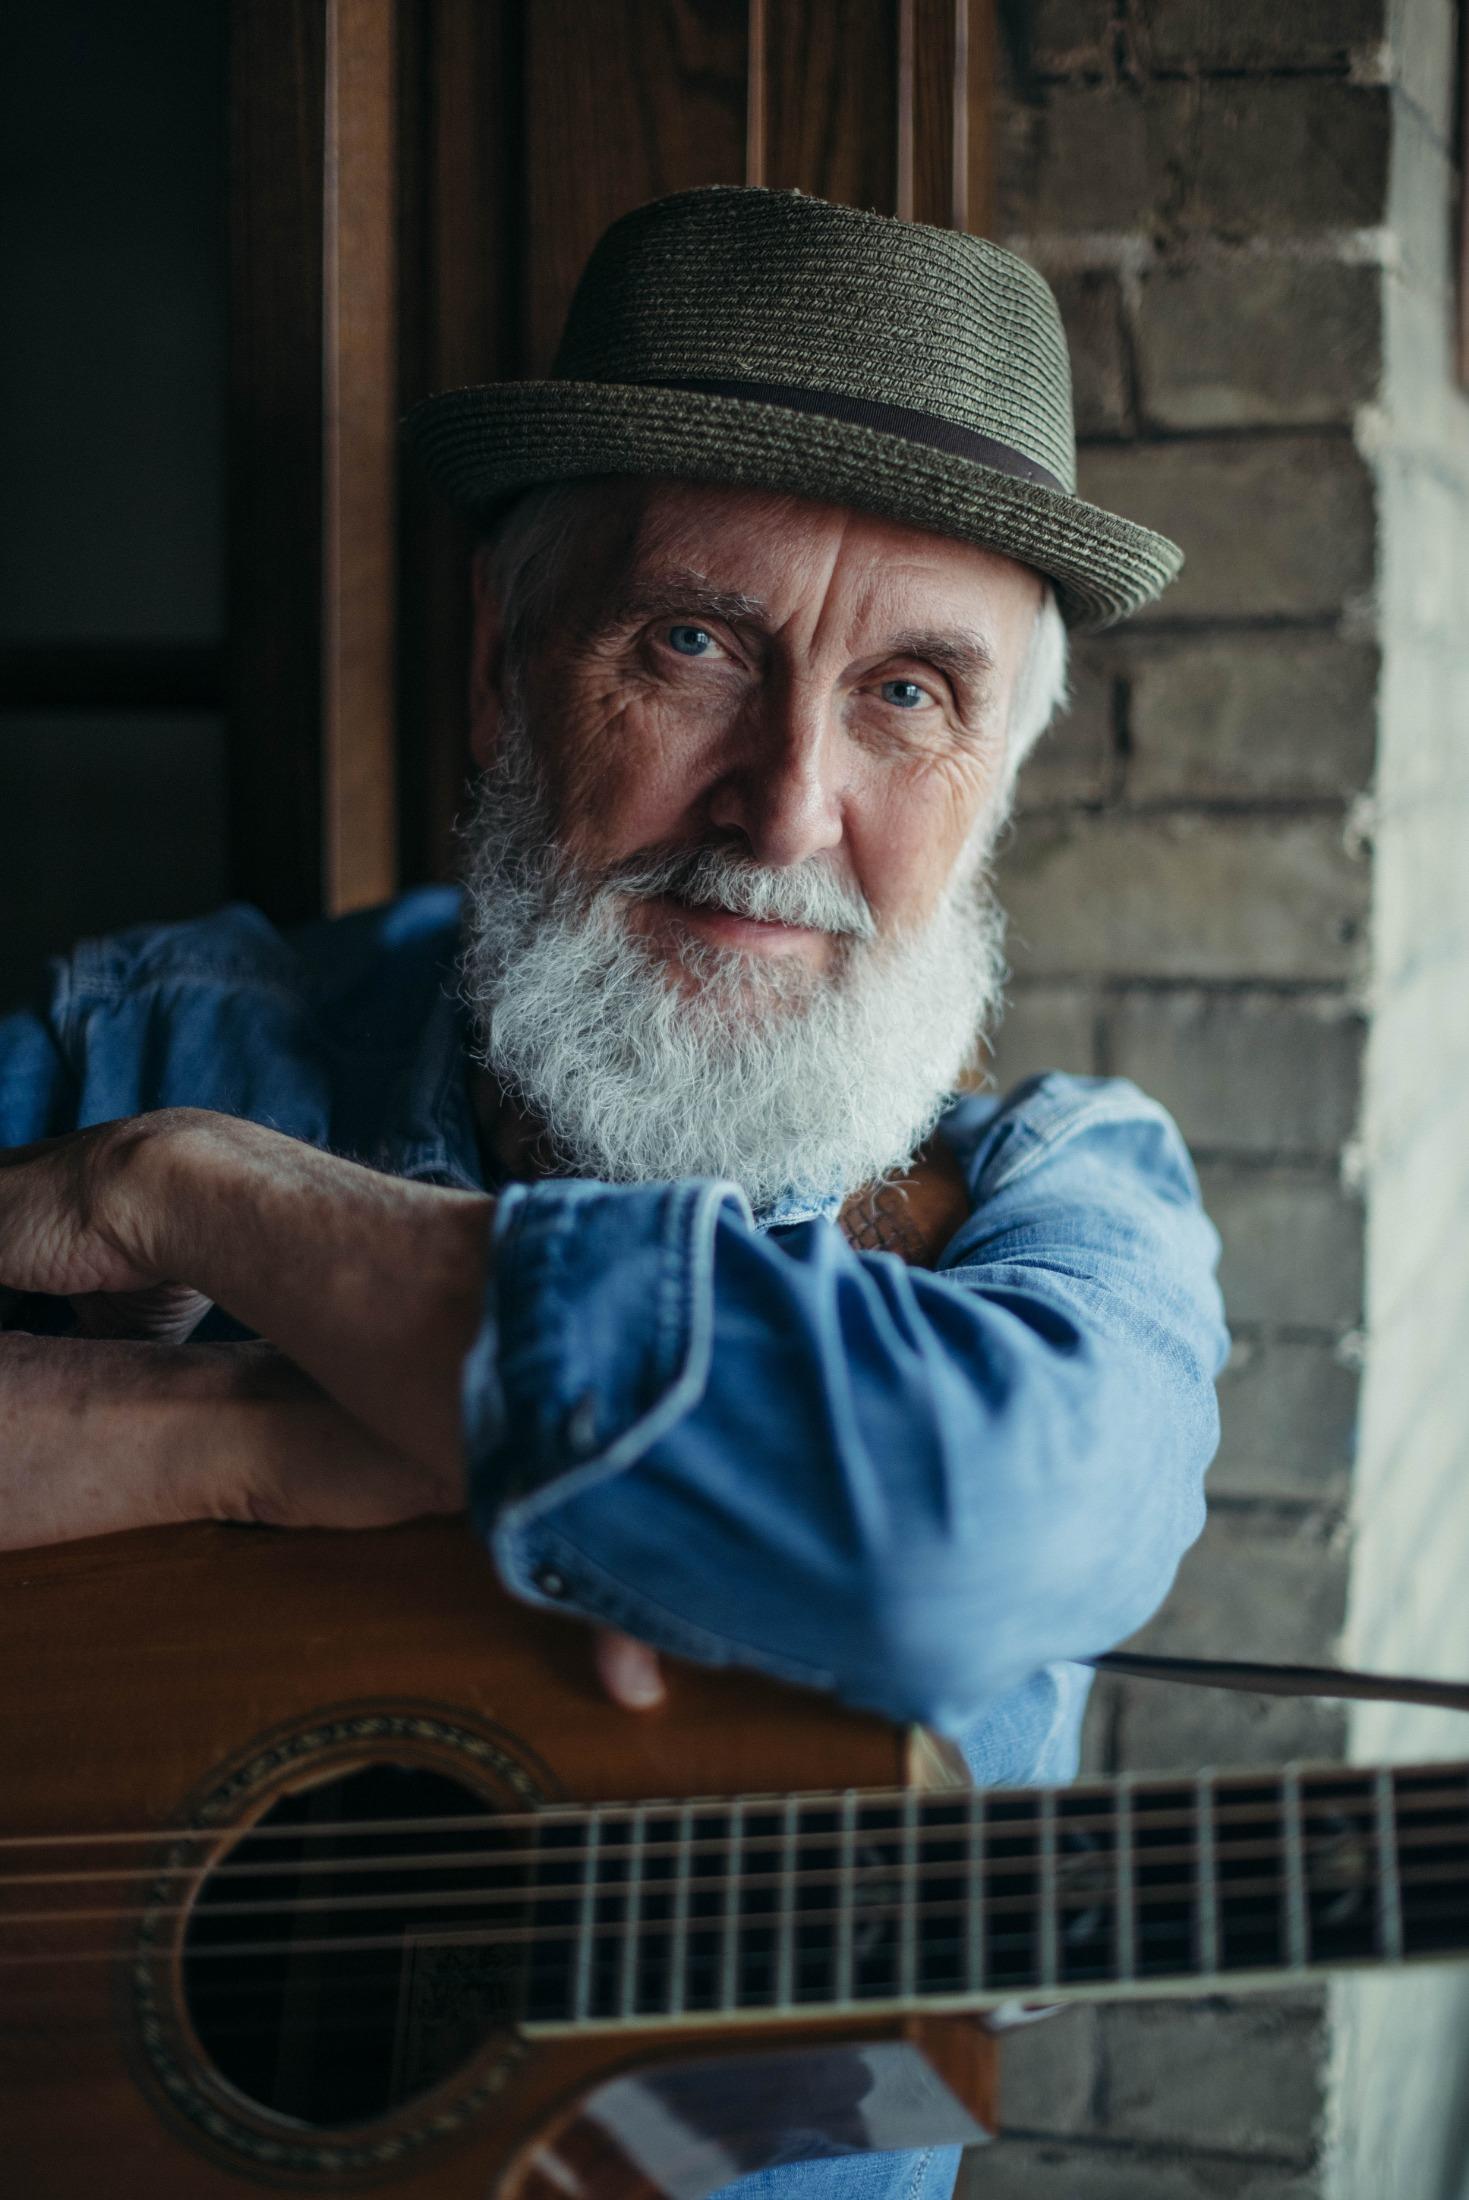 Fred Penner musician